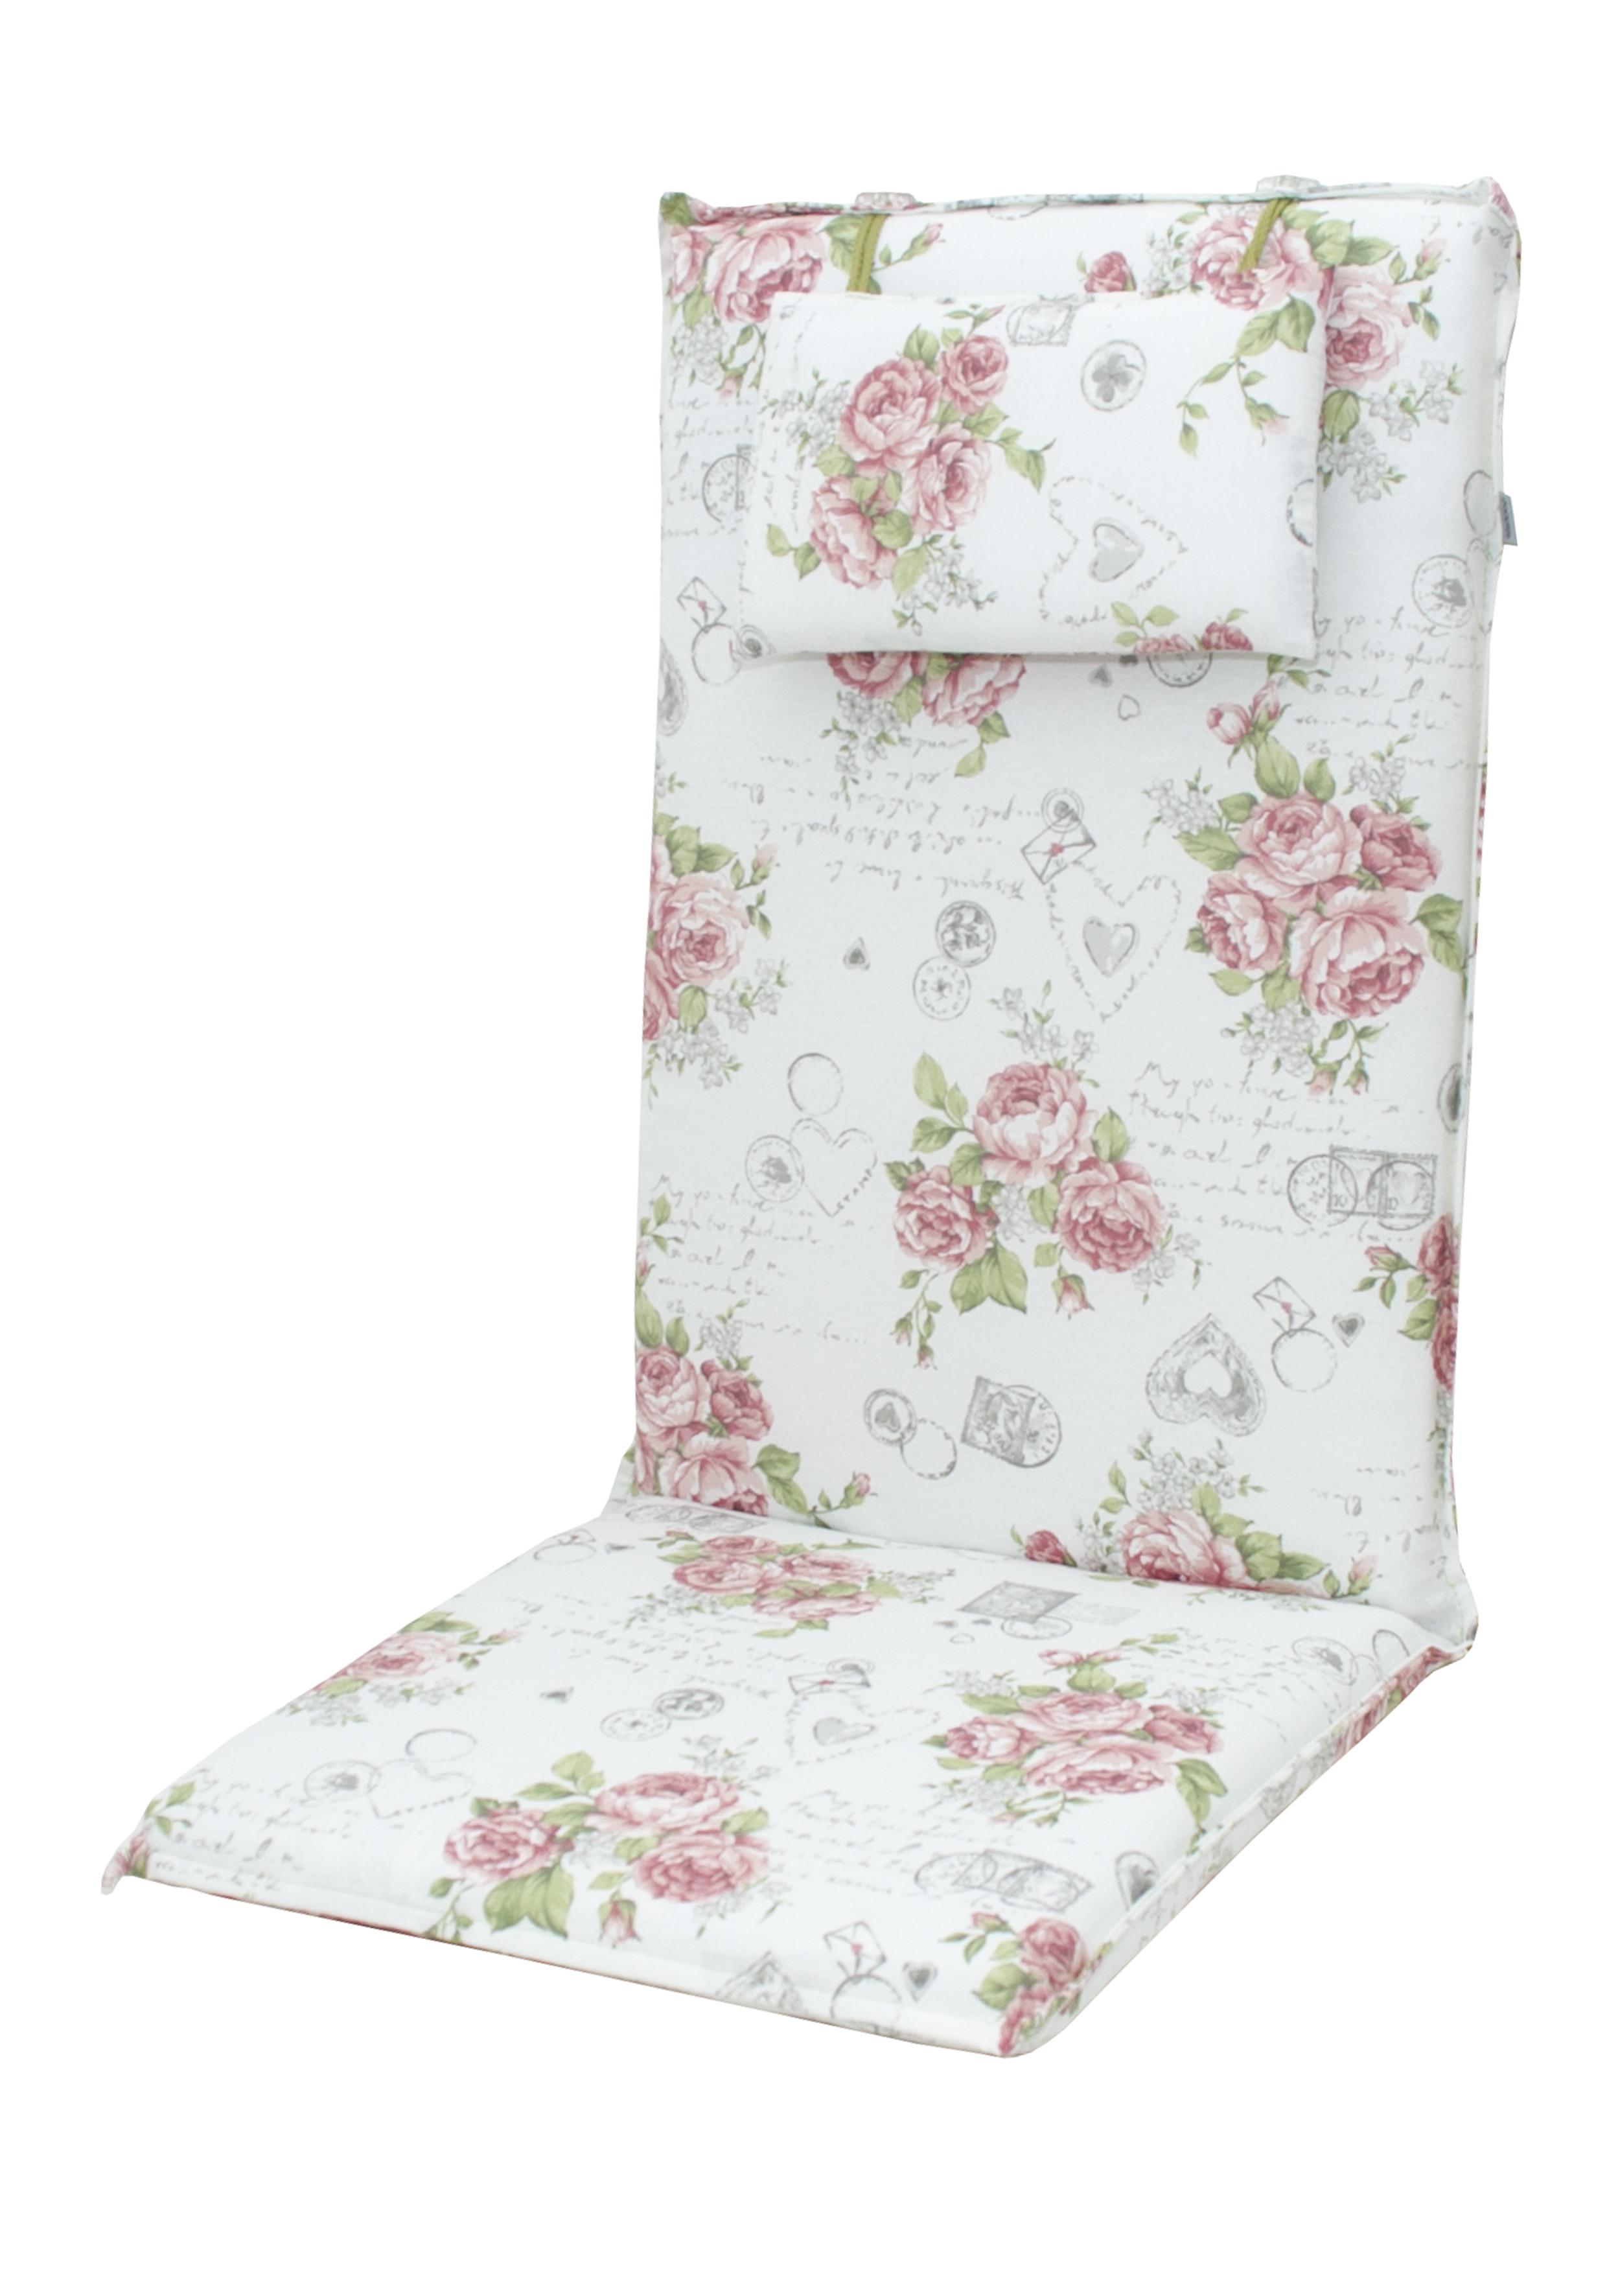 ELEGANT 2232 vysoký - polstr na židli a křeslo s podhlavníkem